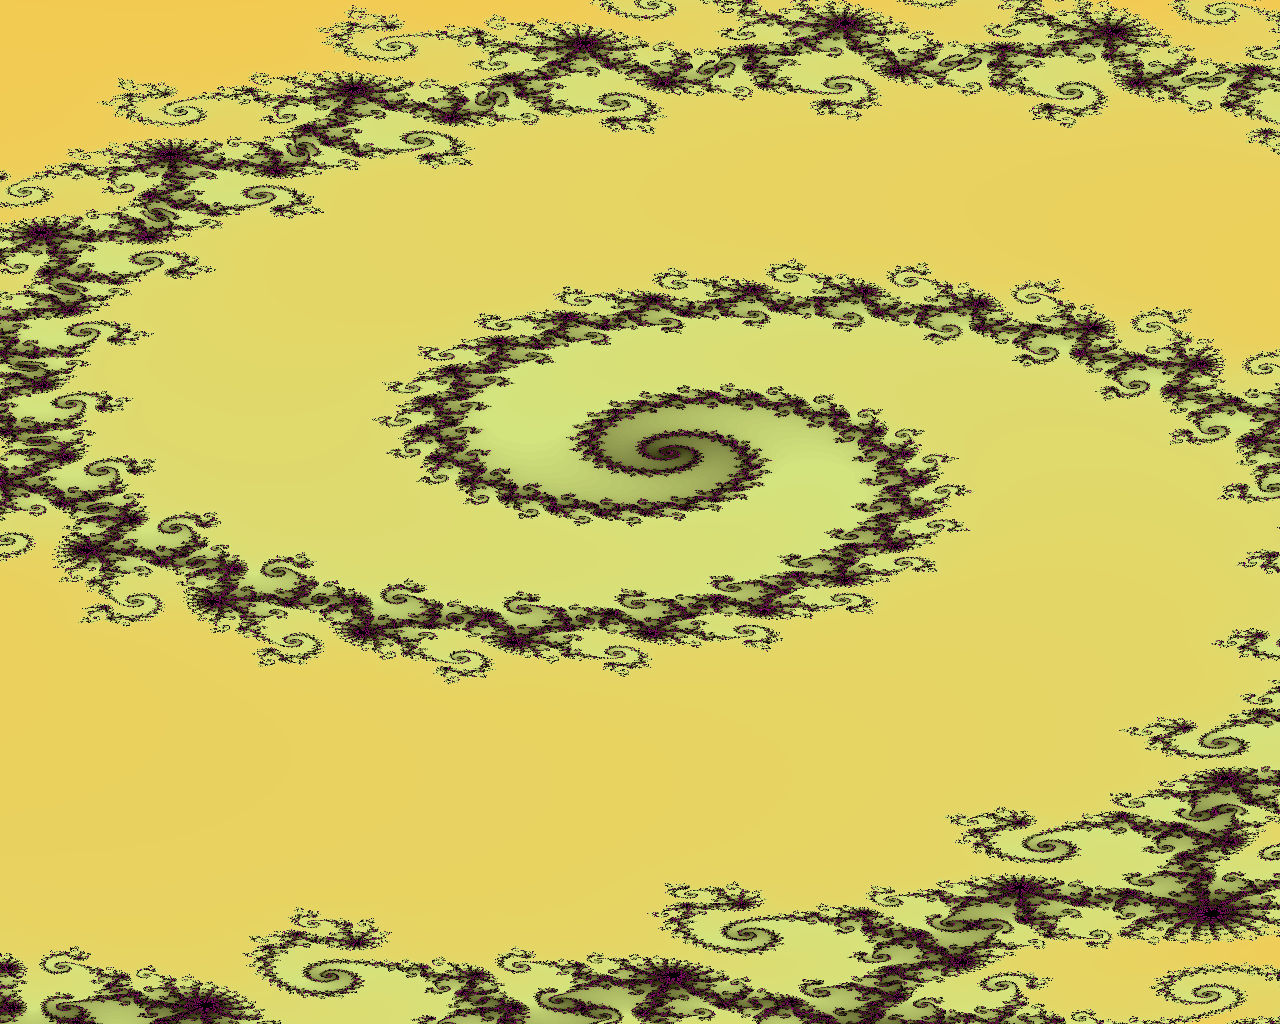 Mandelbrot Fractal set - 4:3 - 1280x1024